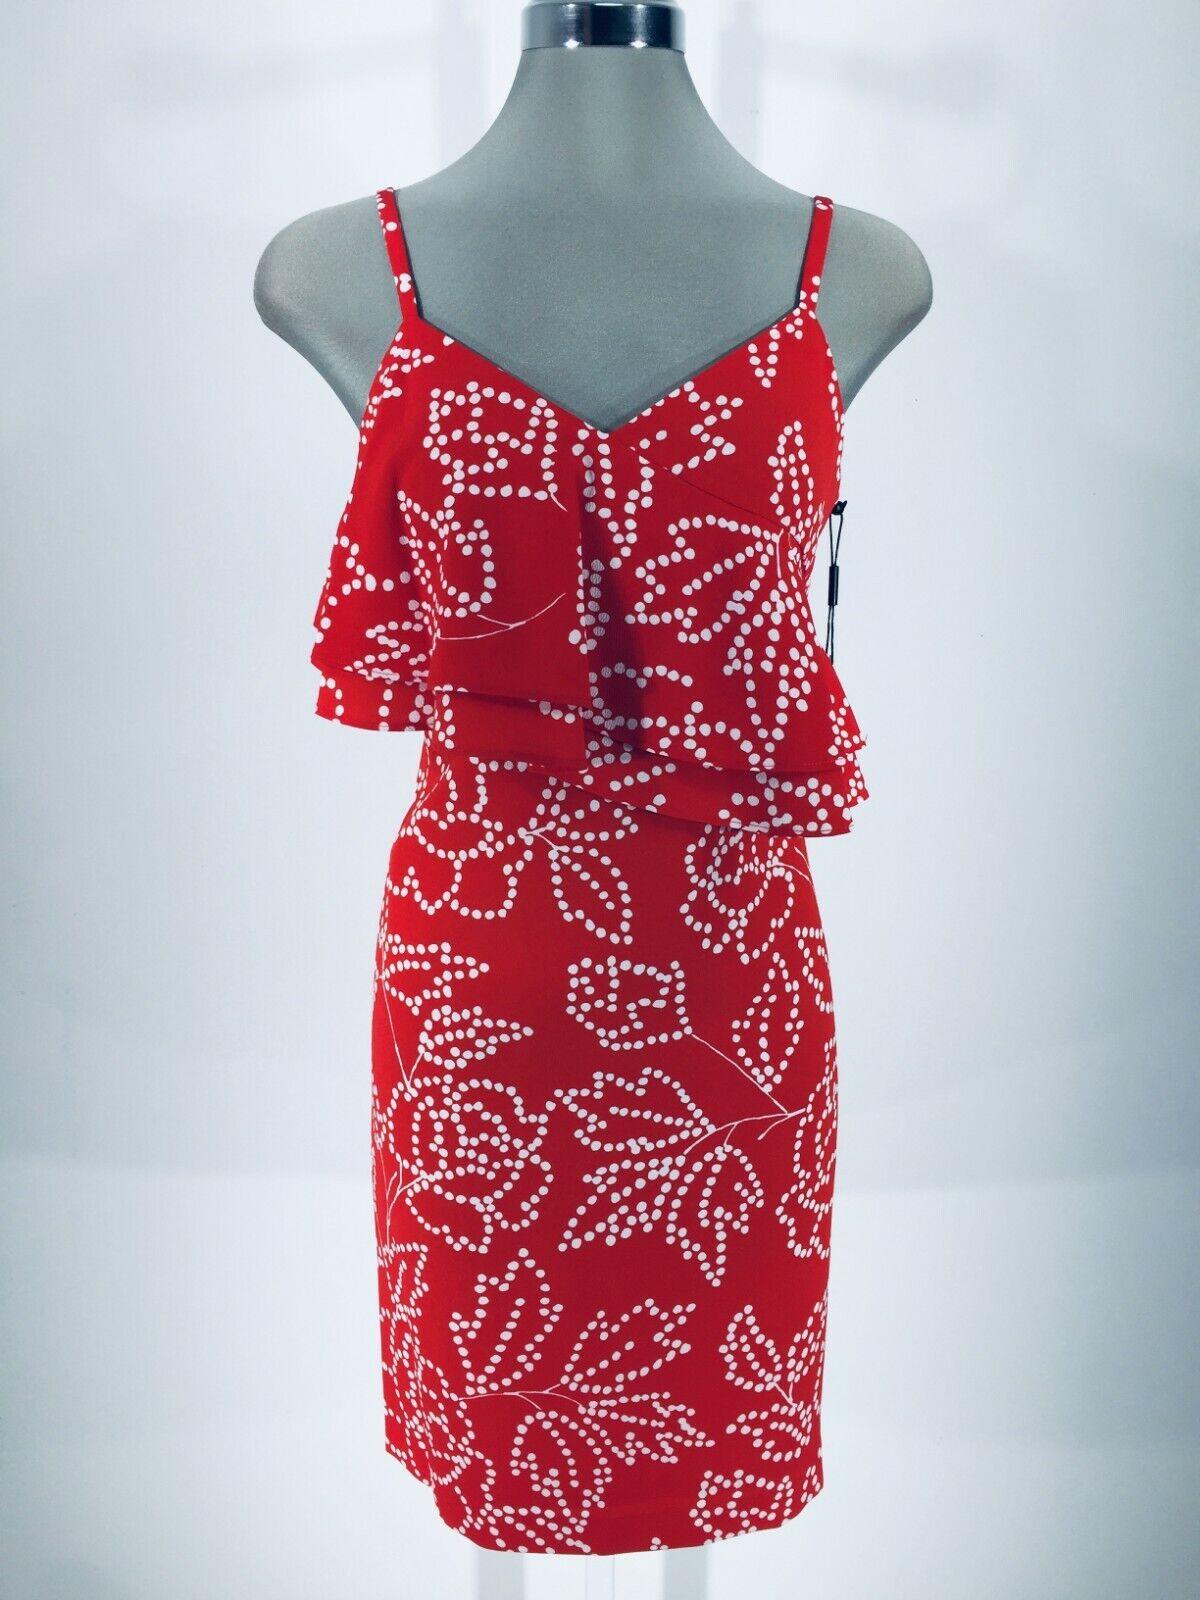 92735e2c8ccce2 Karl Lagerfeld Paris Neu Wt Feuerrot Spaghettiträger Kleid Größe 0,2,4,6